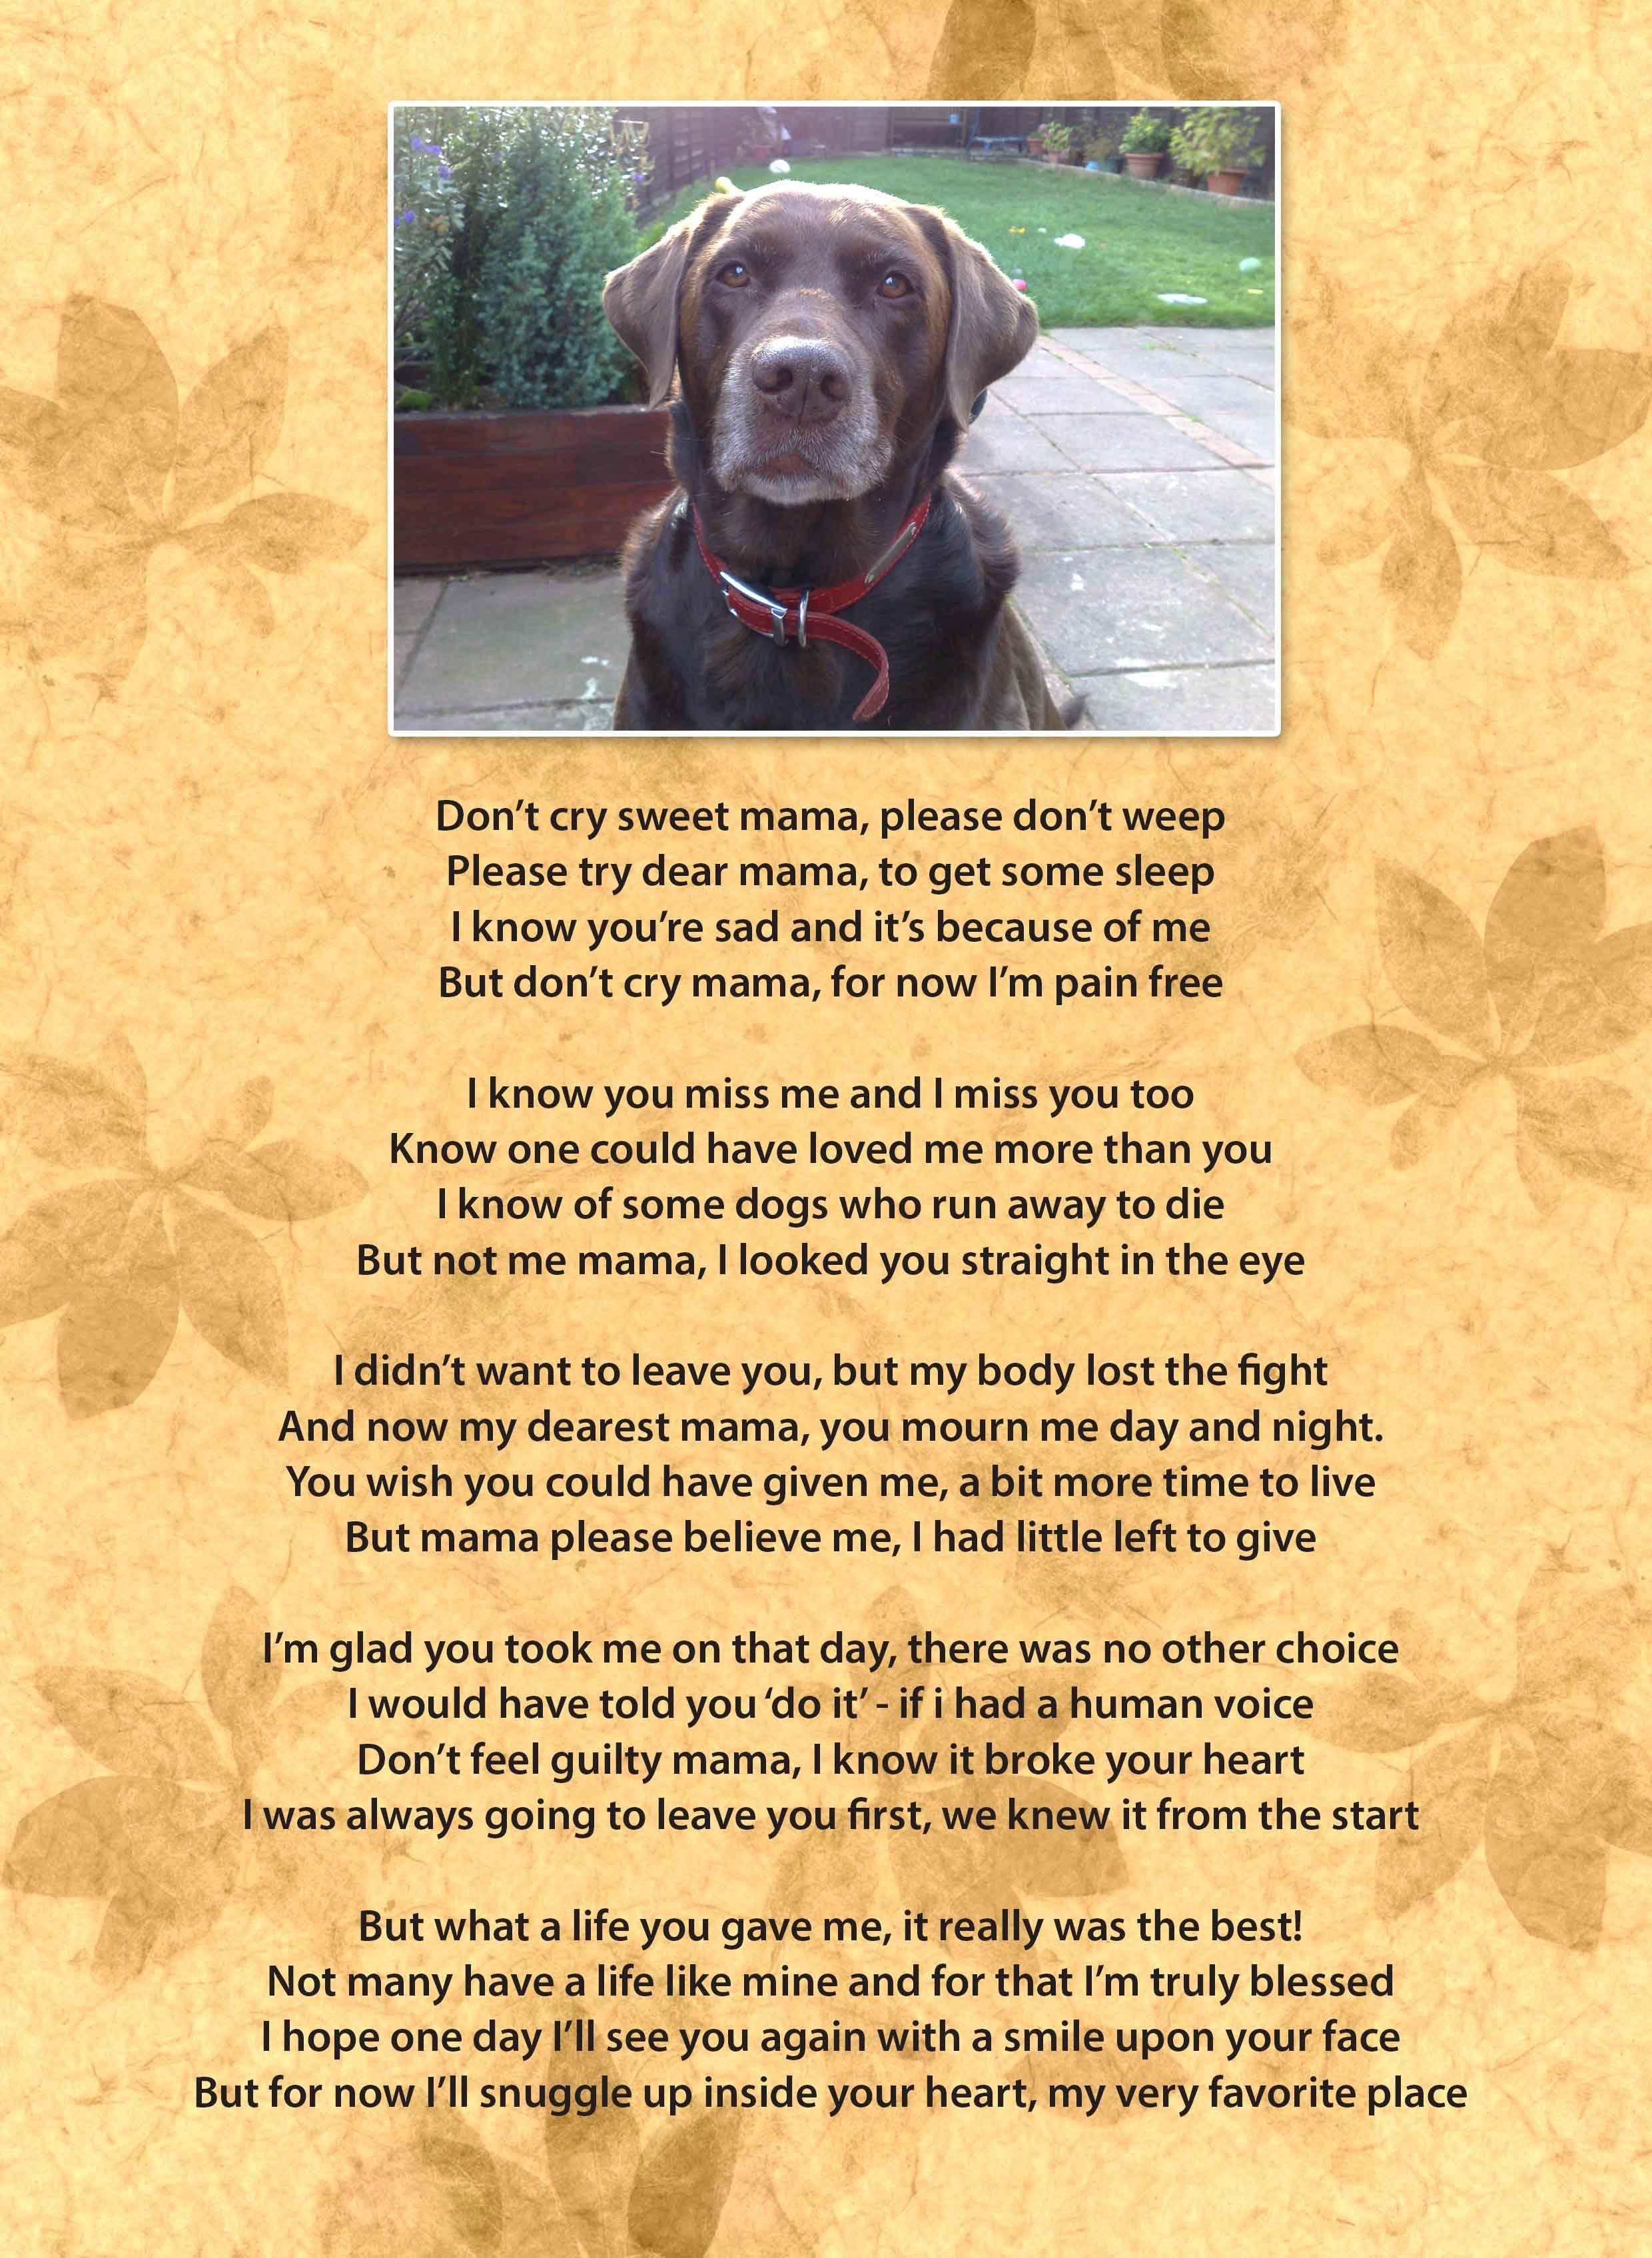 3addf86b607f56638c87b597c2b48a3d - How Long Does It Take To Get Over A Loss Of A Pet